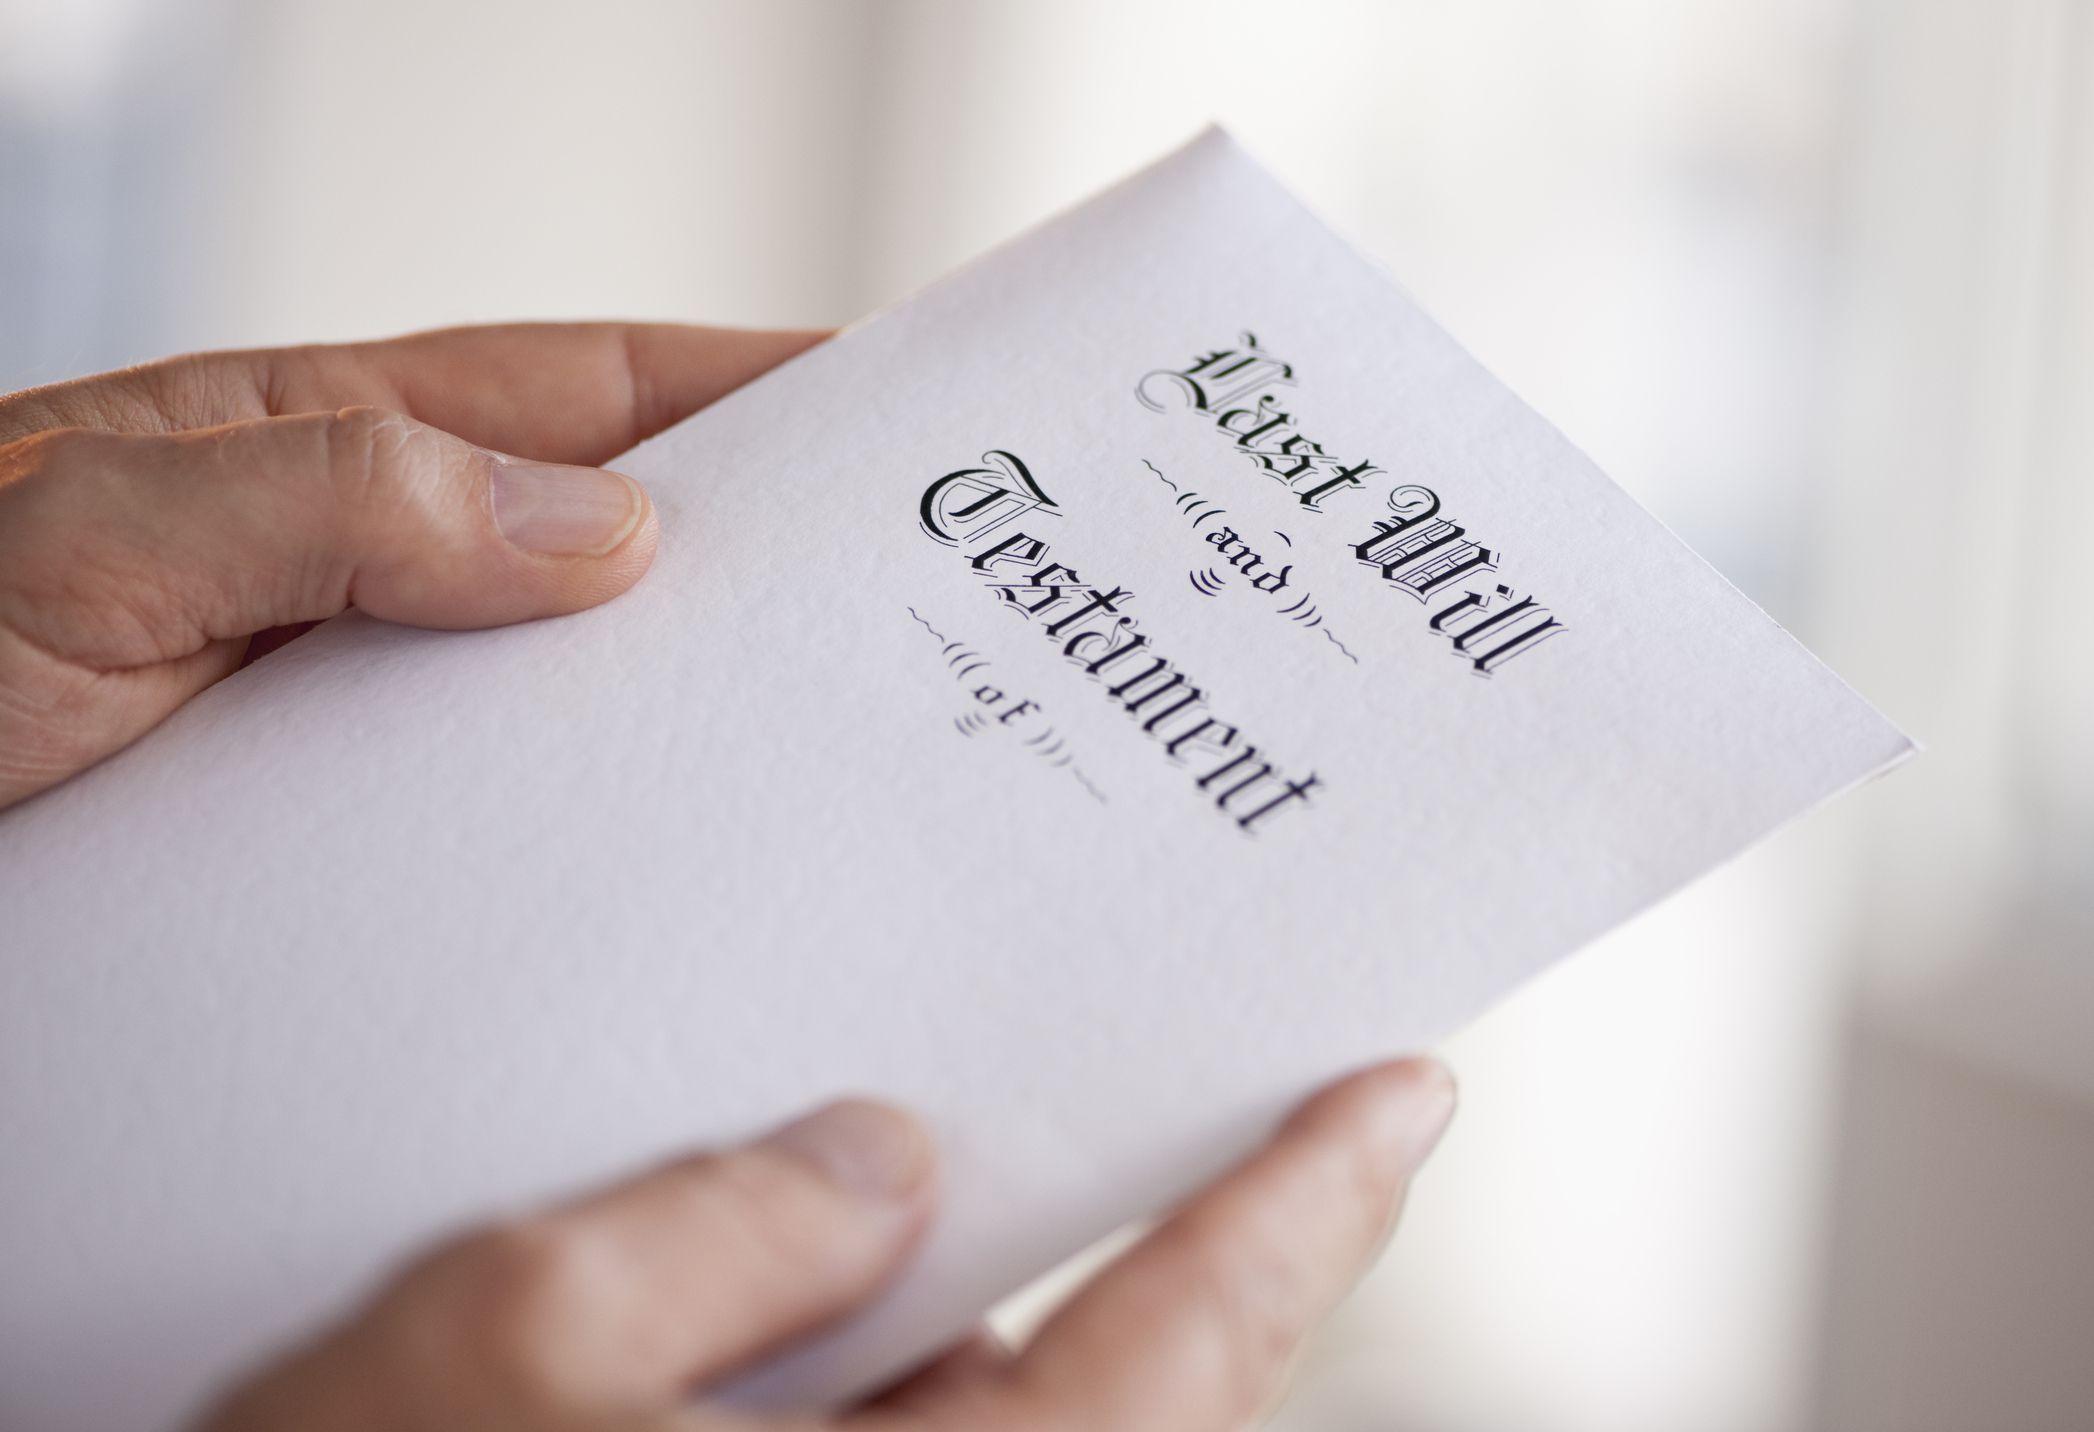 James Gandolfini's Last Will and Testament